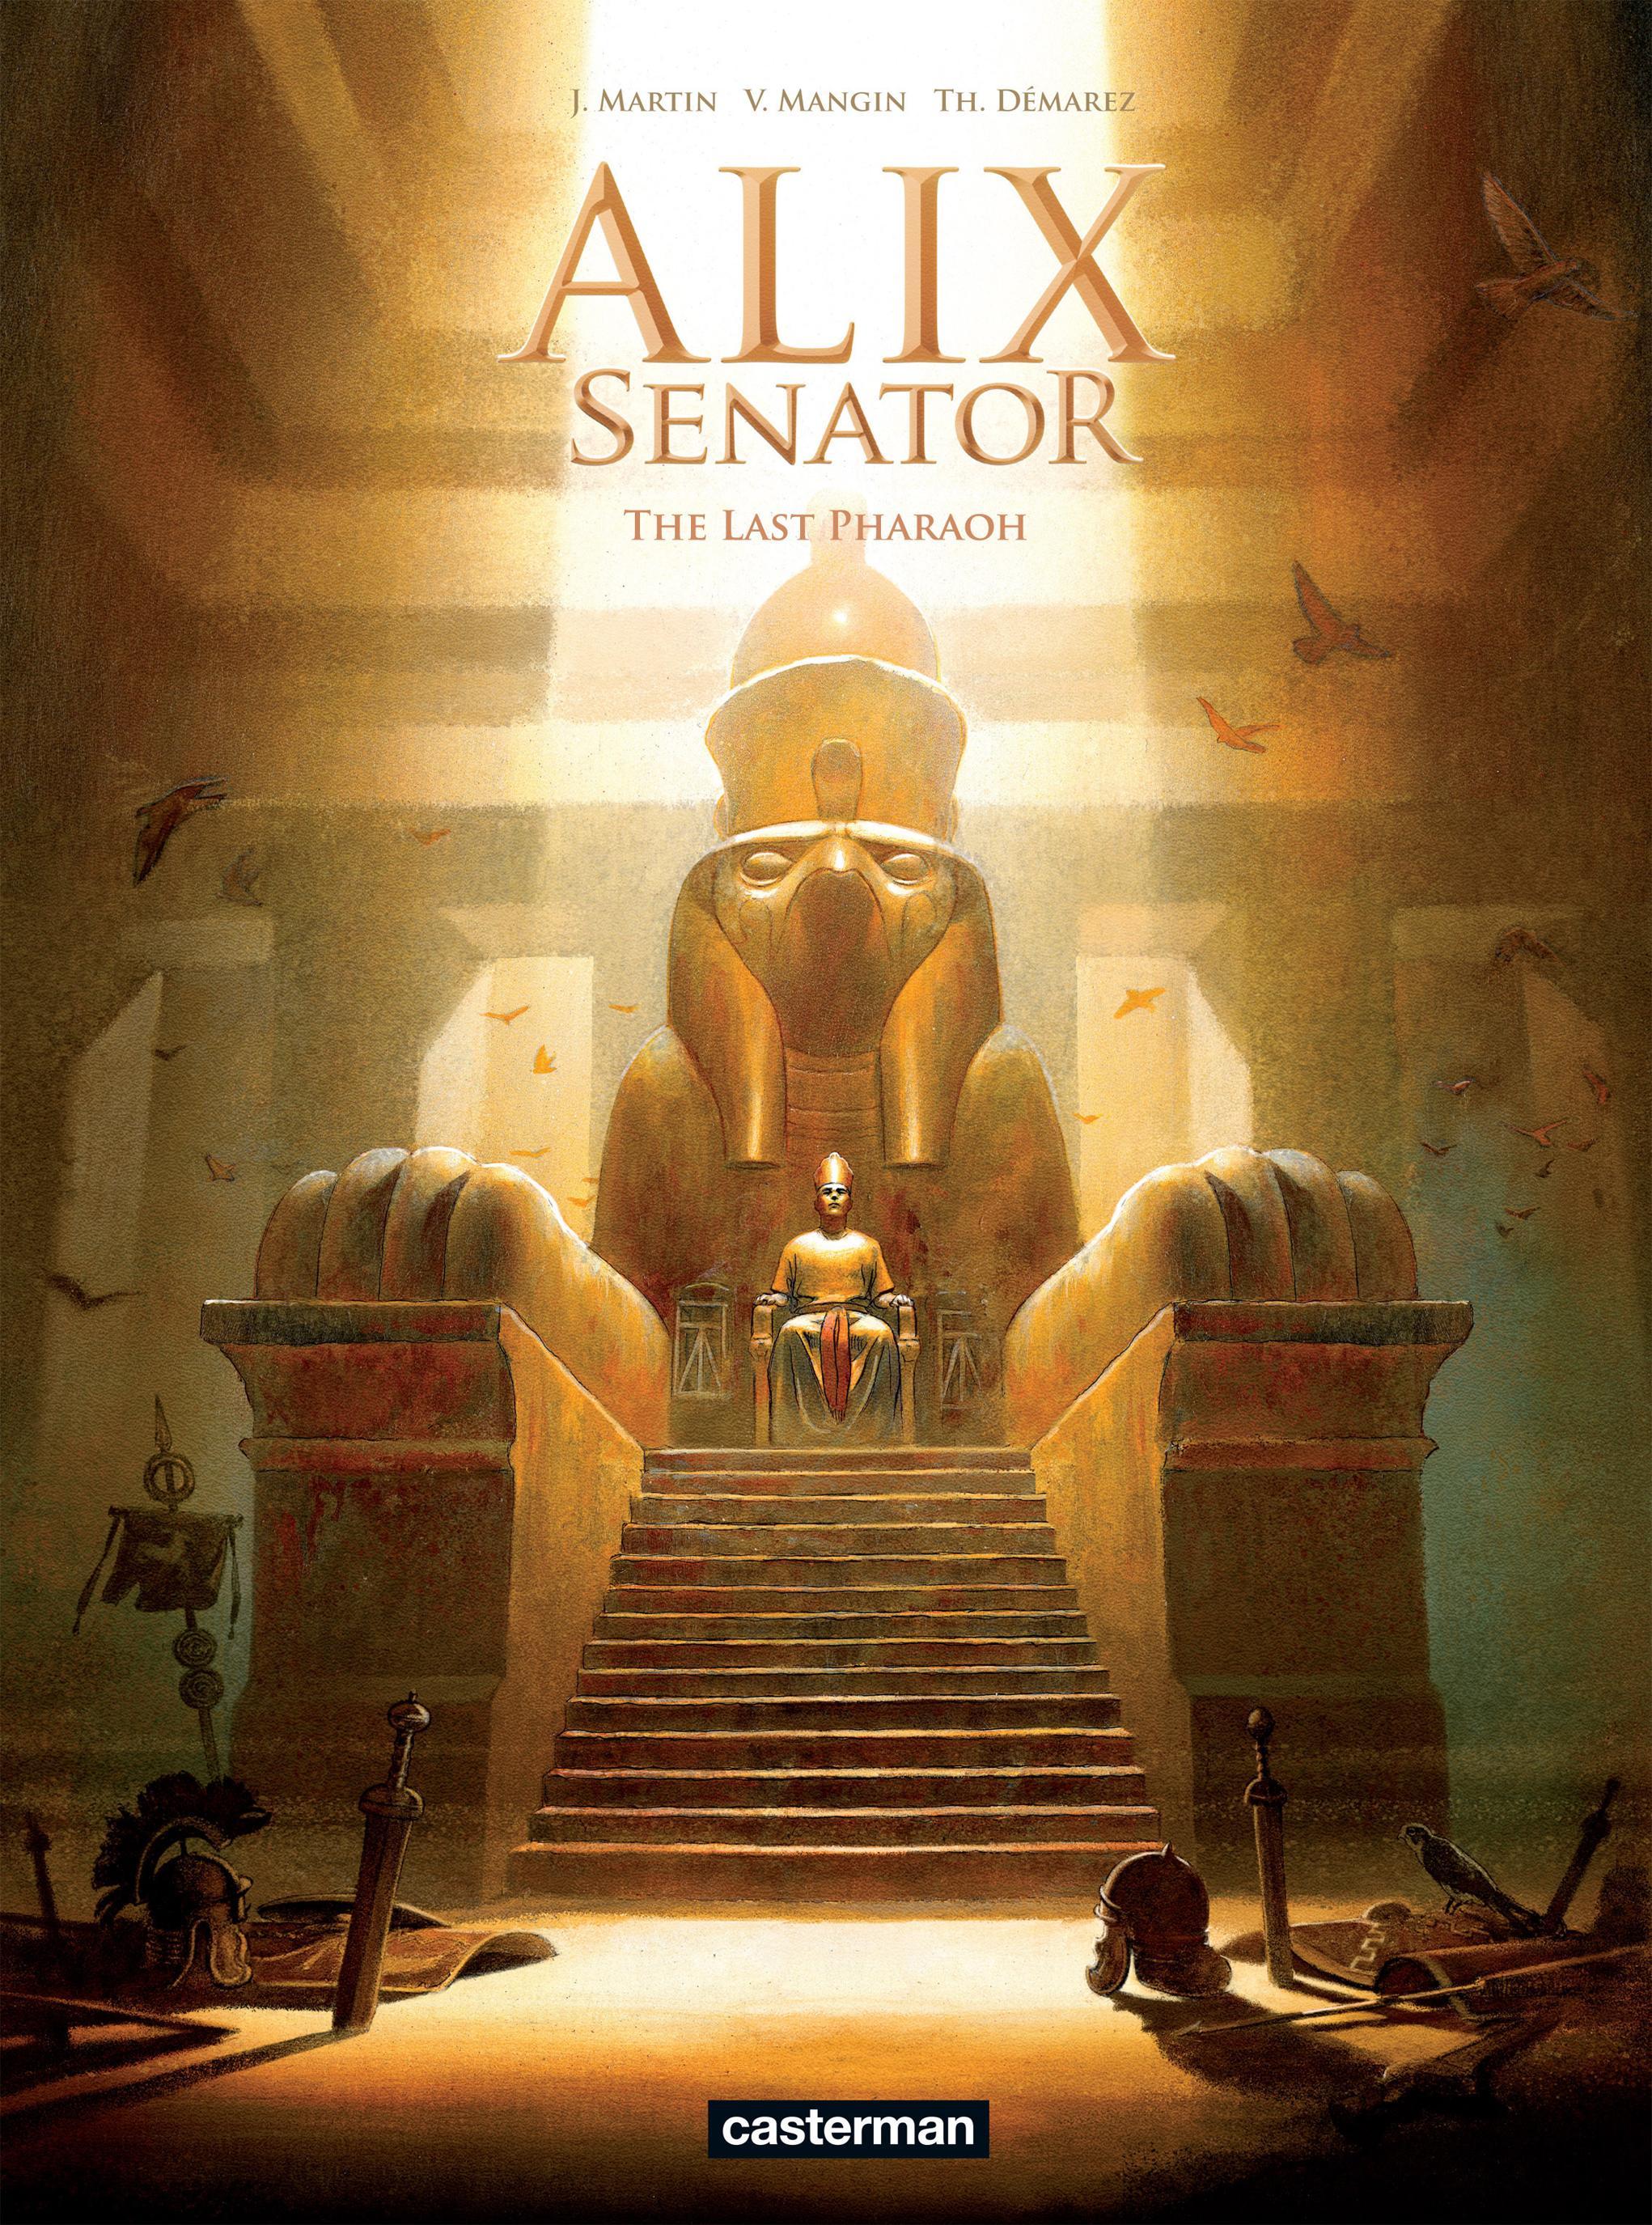 Alix Senator 02 - The Last Pharoah (2013) (Scanlation) (phillywilly-Vee